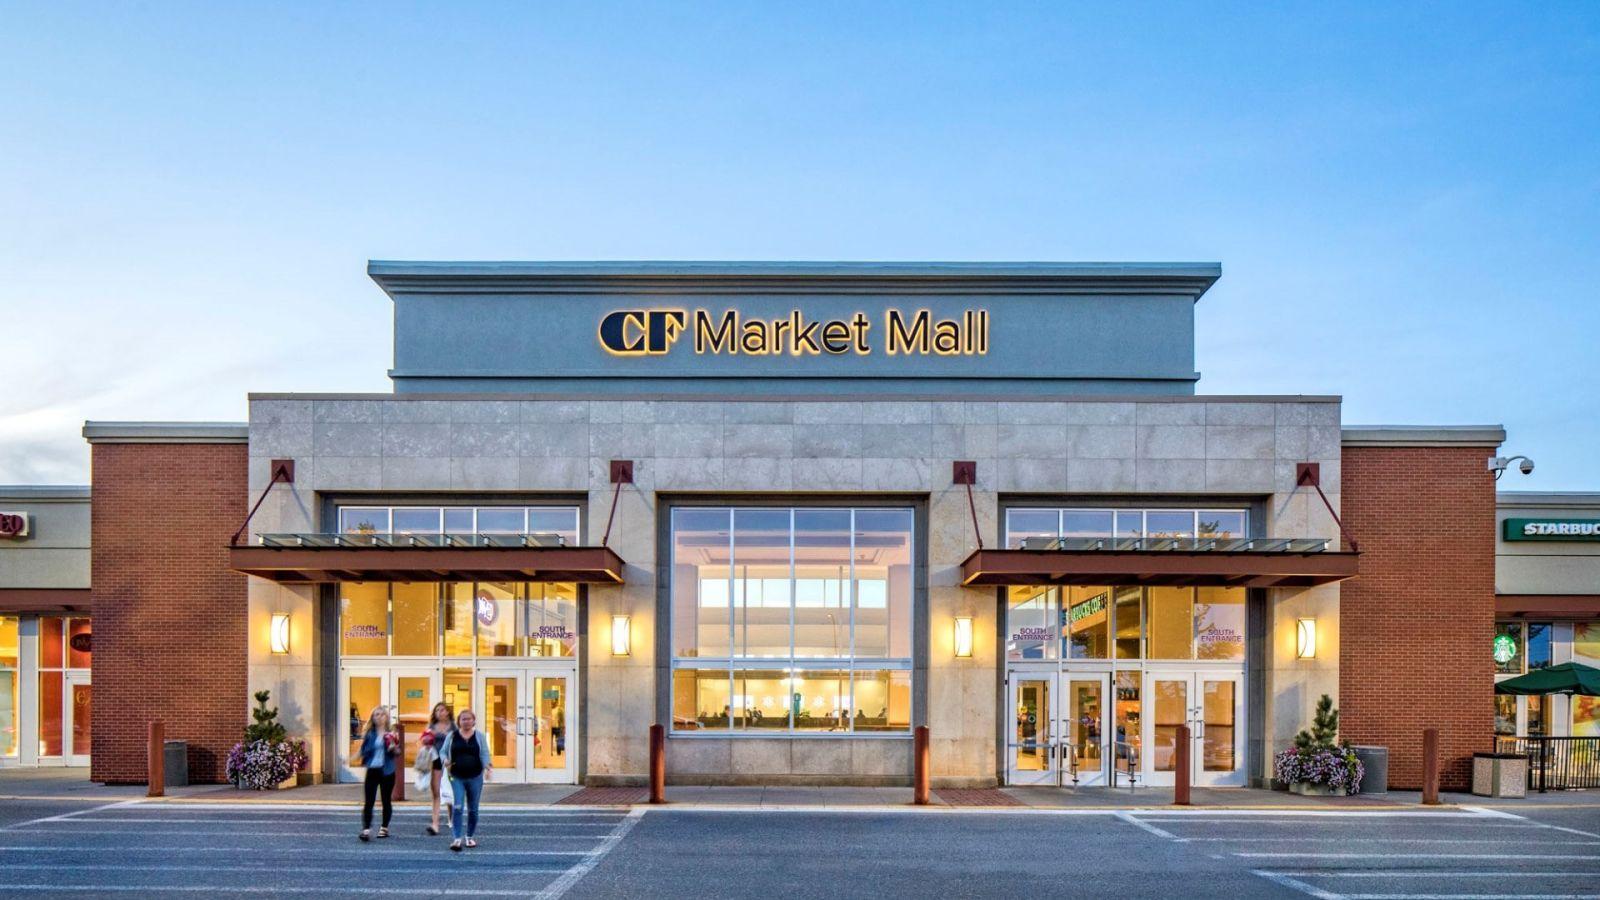 [CF Market Mall] Opengraph